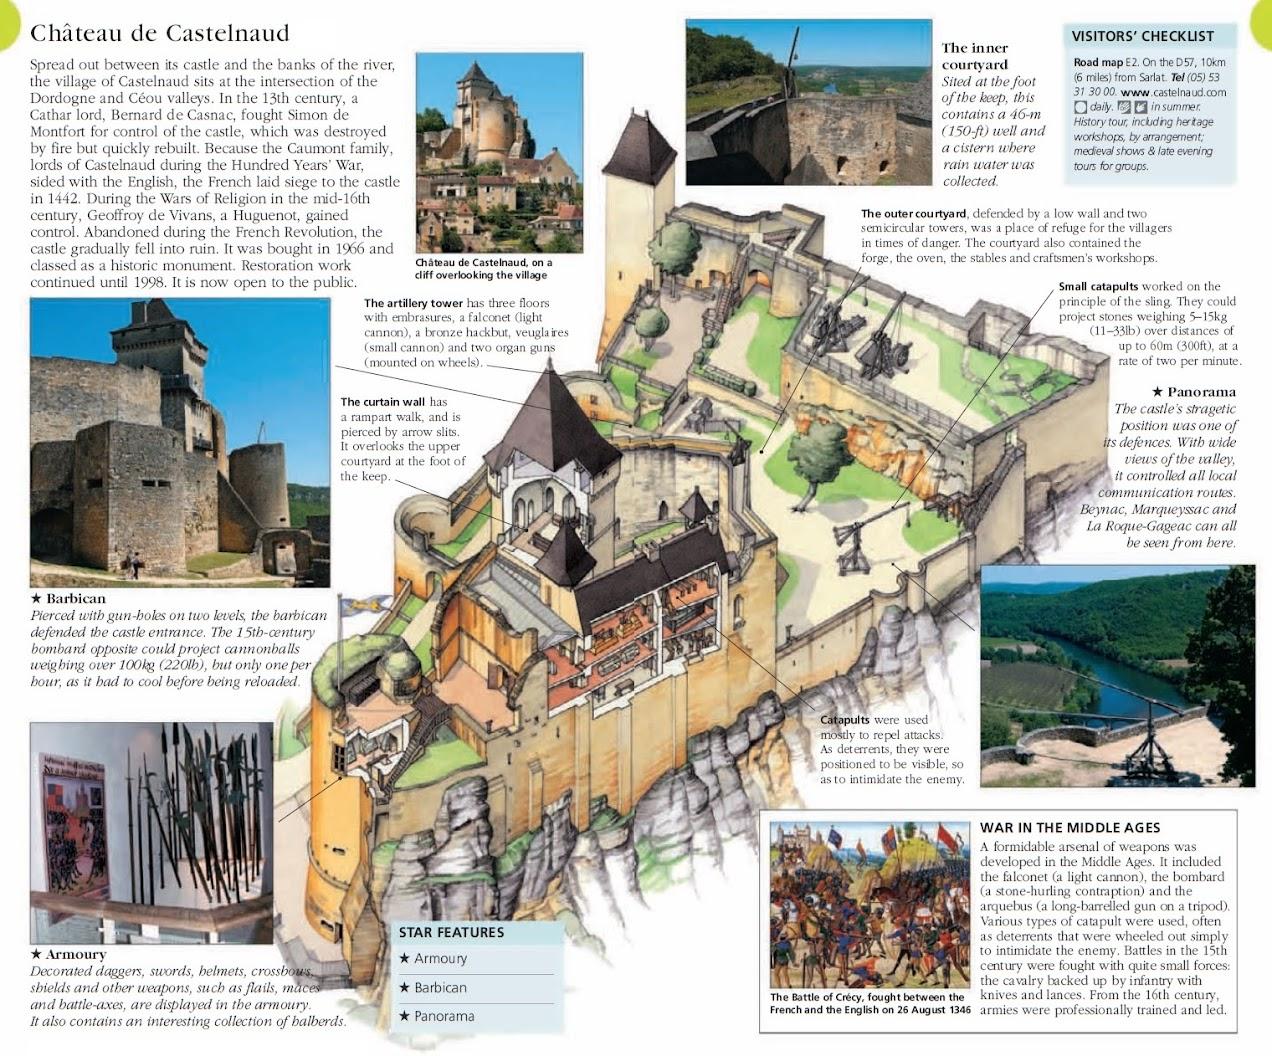 Chateau Castelnaud-la-Chapelle, Chateau Castelnaud, замок Кастельно ля Шапель - один из замков катаров в Аквитании